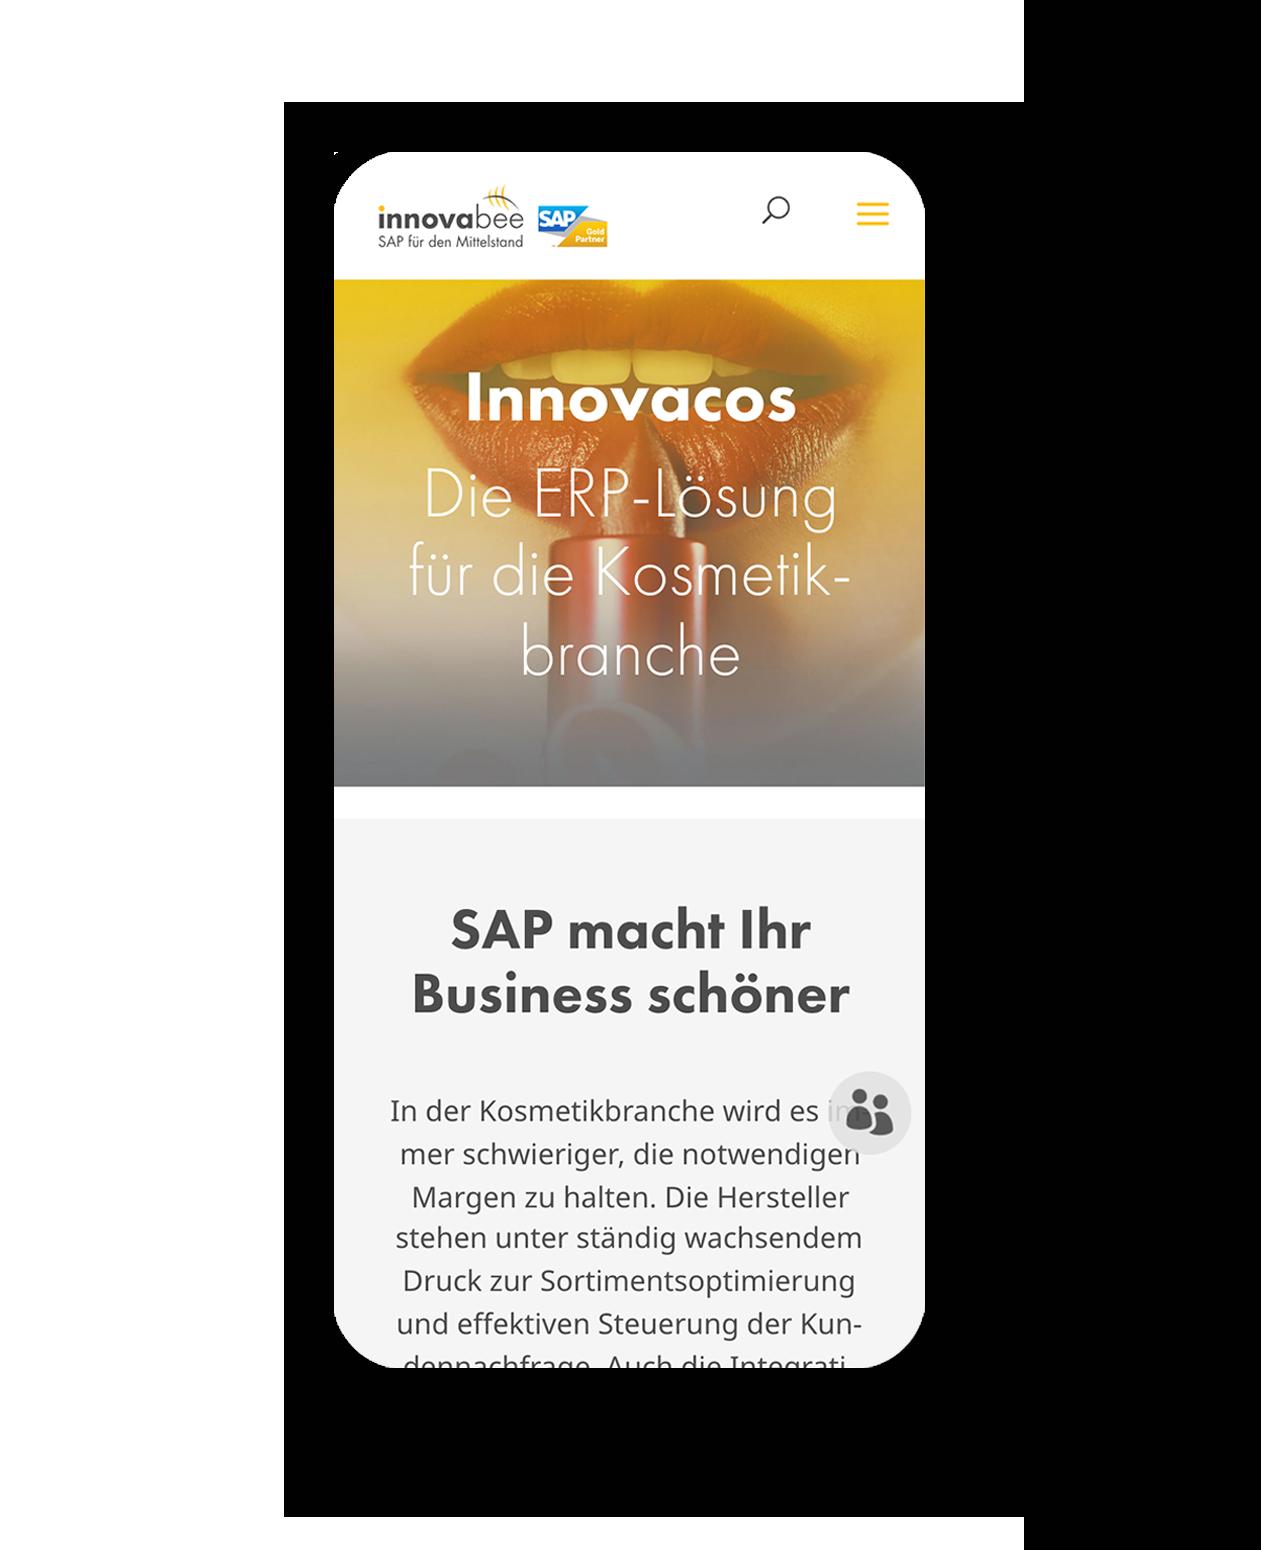 Innovabee